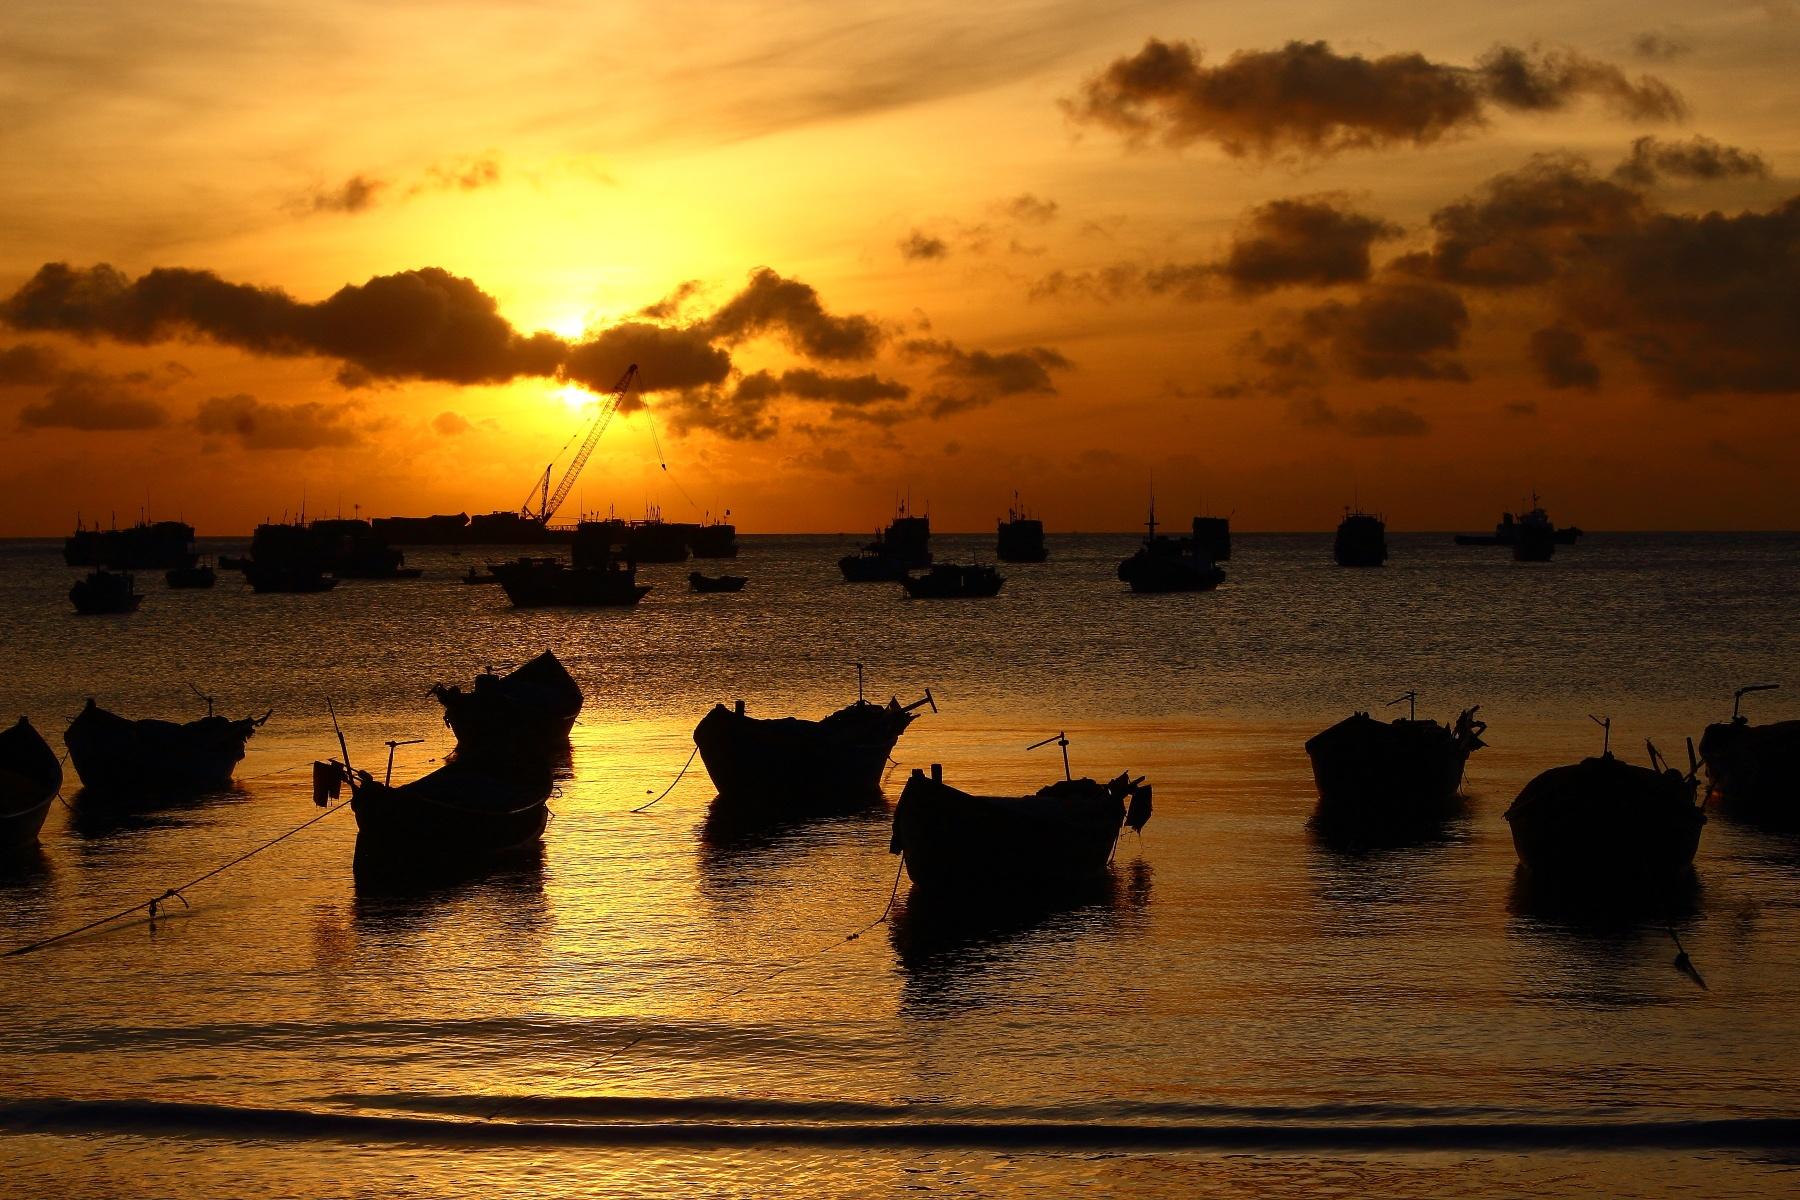 fishing boats by paul.terrance.56